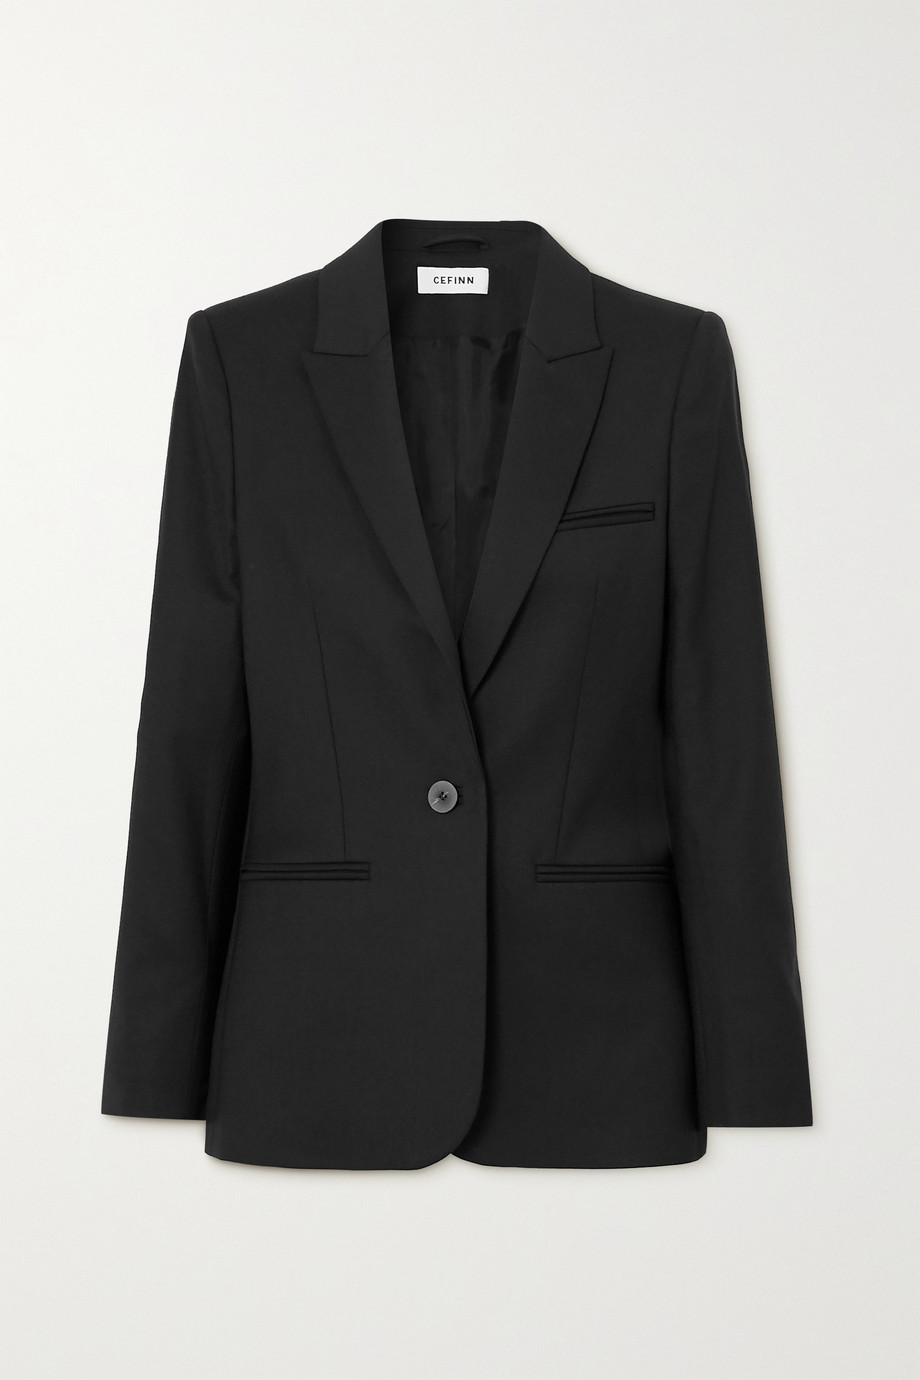 Cefinn Jamie 斜纹布西装外套